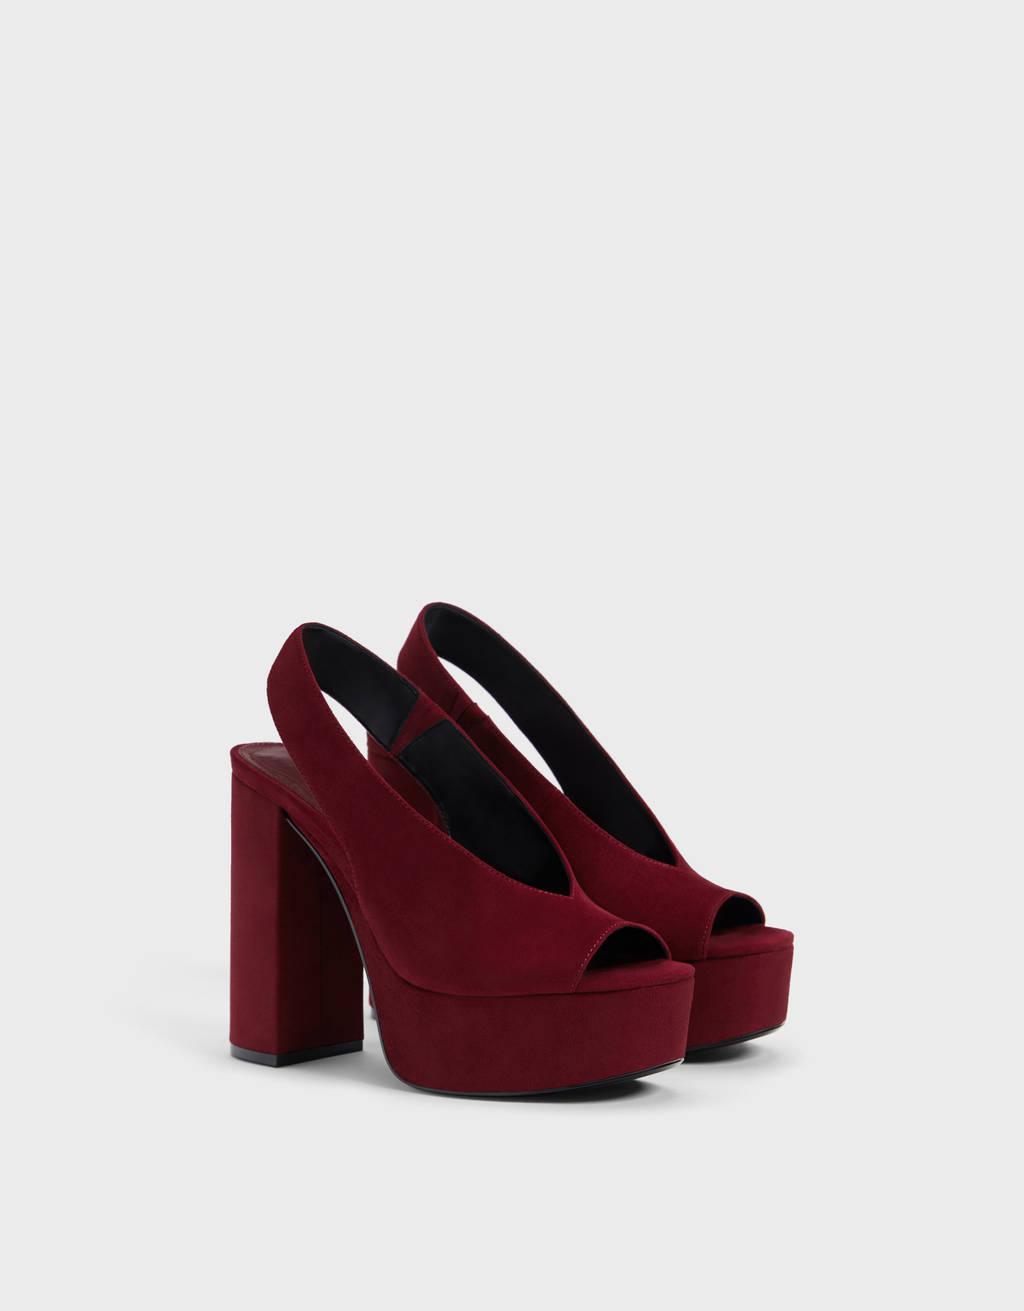 3b5274aa6d Zapatos de mujer - Rebajas de Verano 2019   Bershka